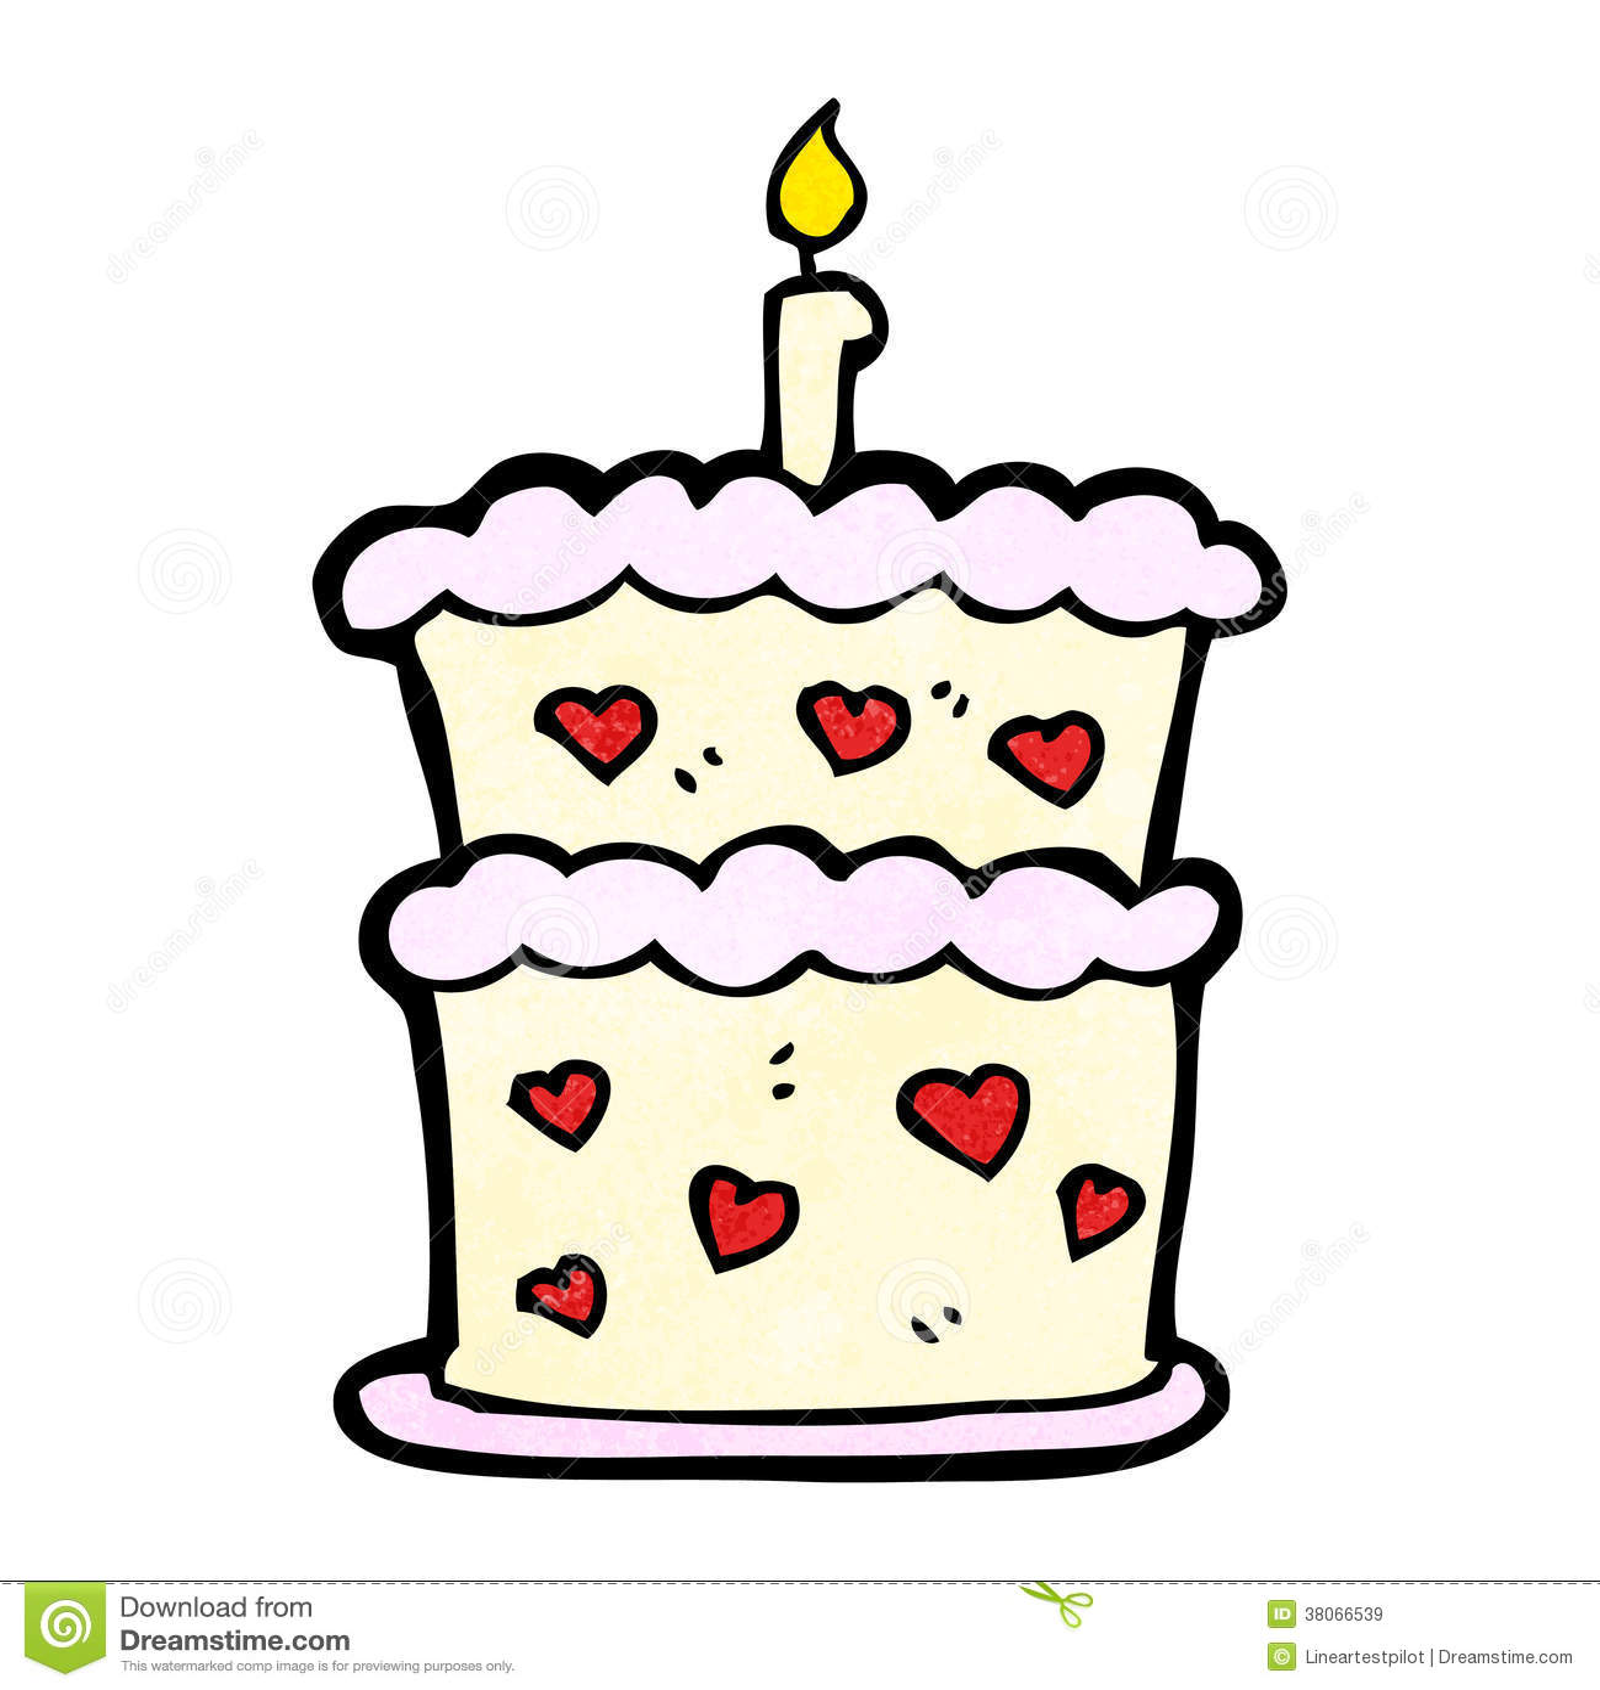 Cartoon Birthday Cake Stock Vector Illustration Of Illustration